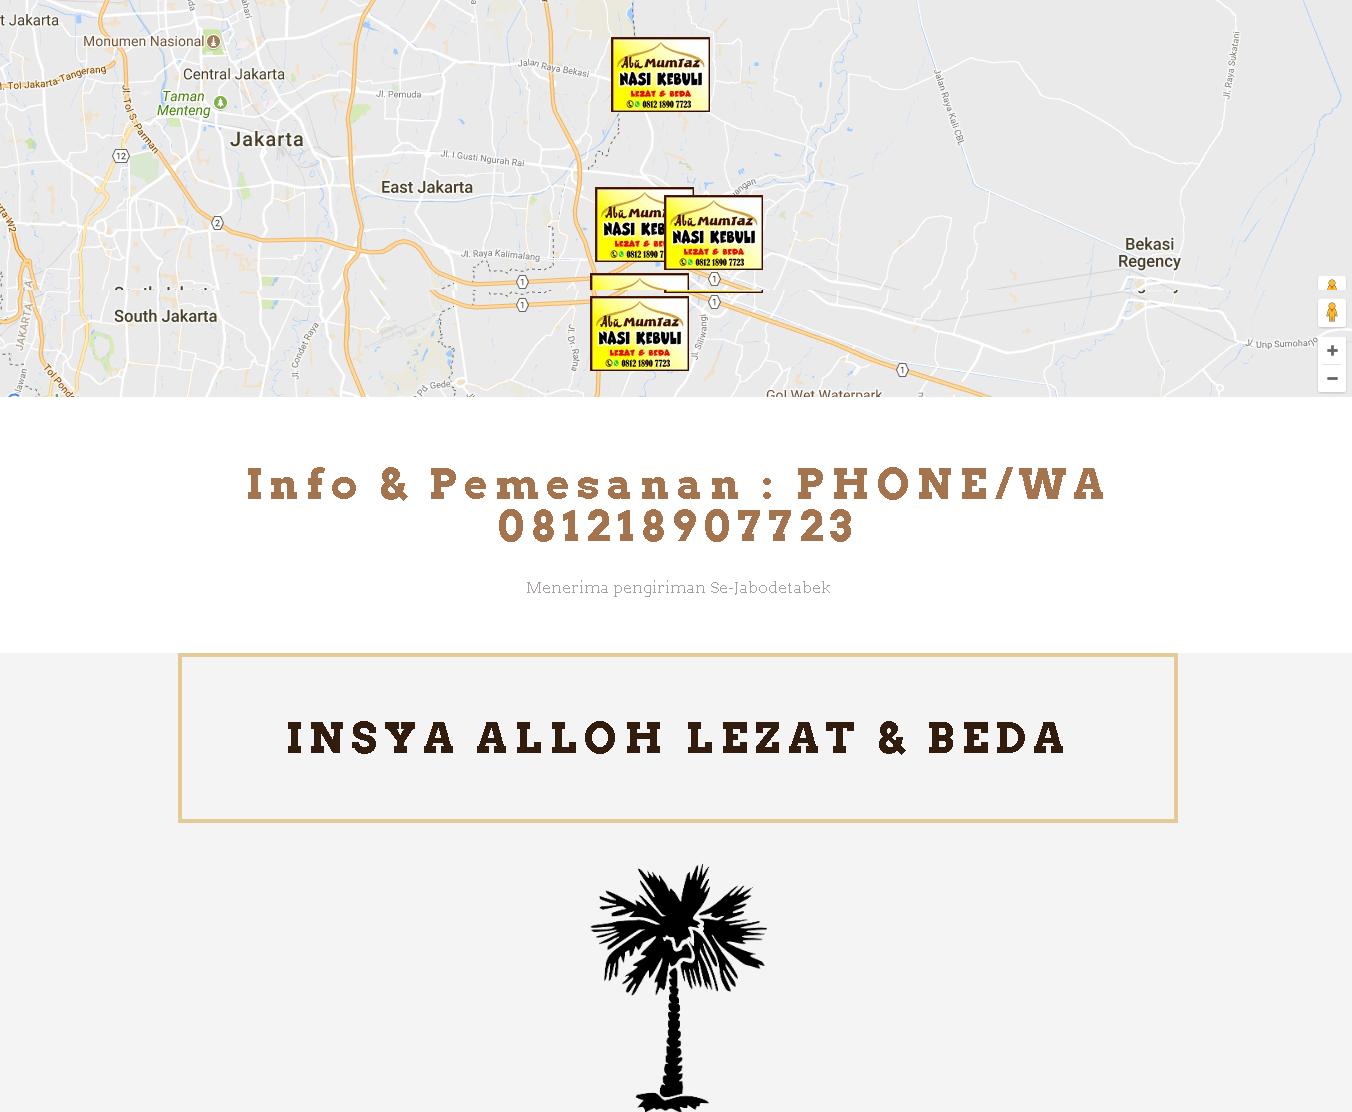 2 Paket Aqiqah Murah Di Jakarta Timur